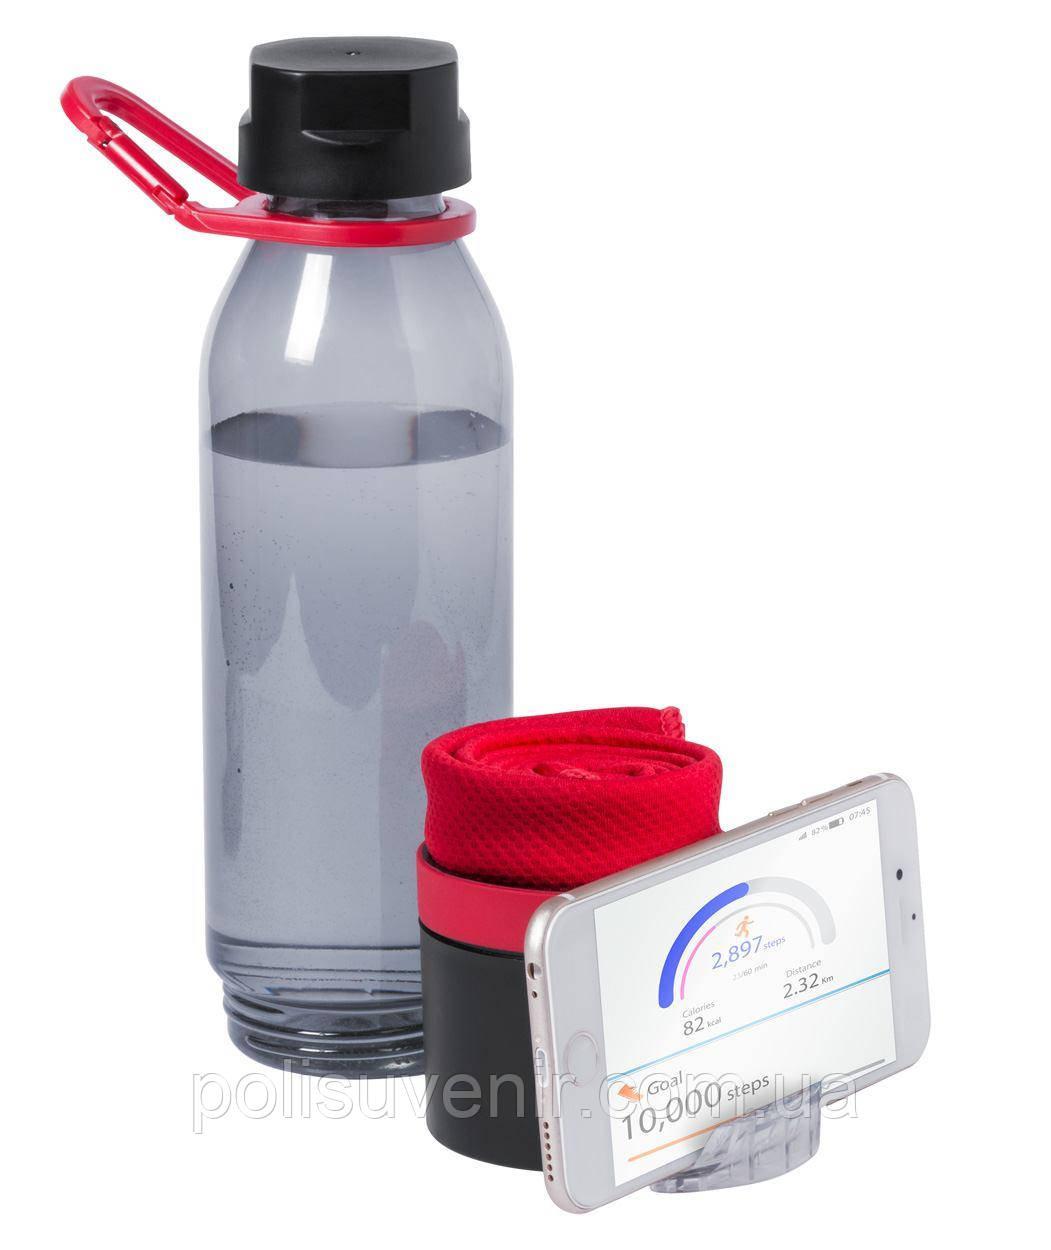 Спортивна пляшка Долтин 650 мл